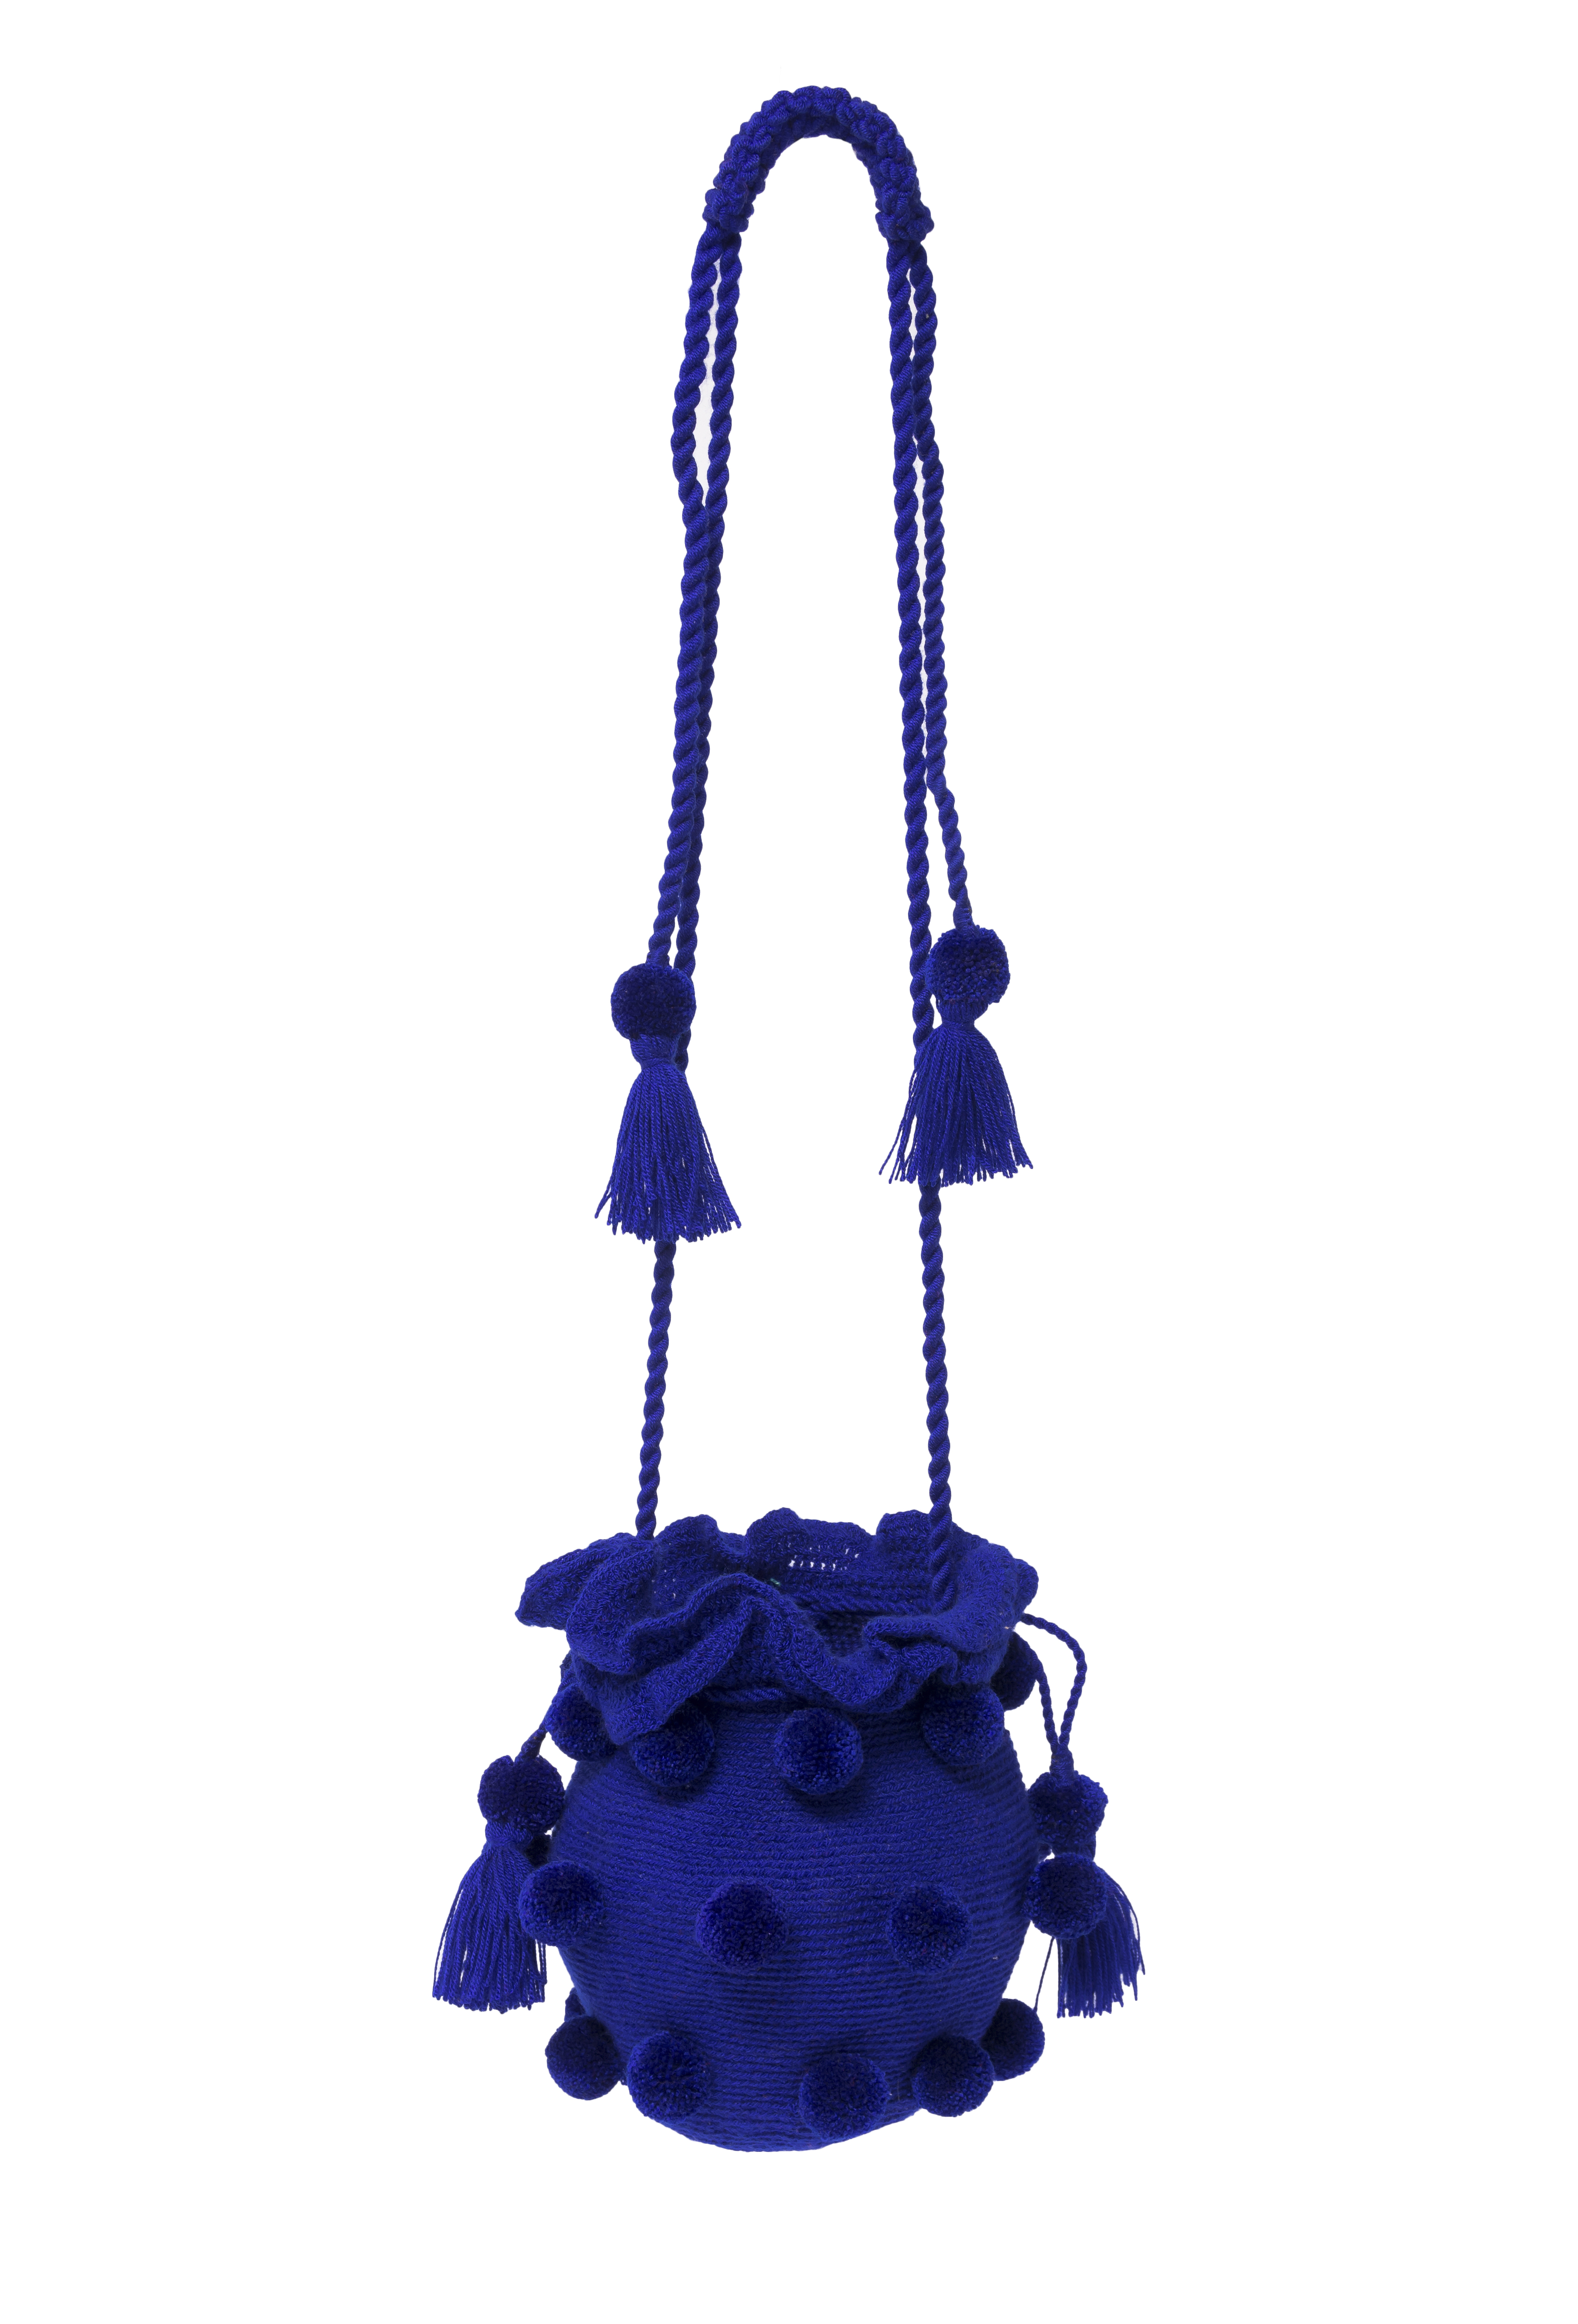 Mochila La Guapa XL,Azul Rey